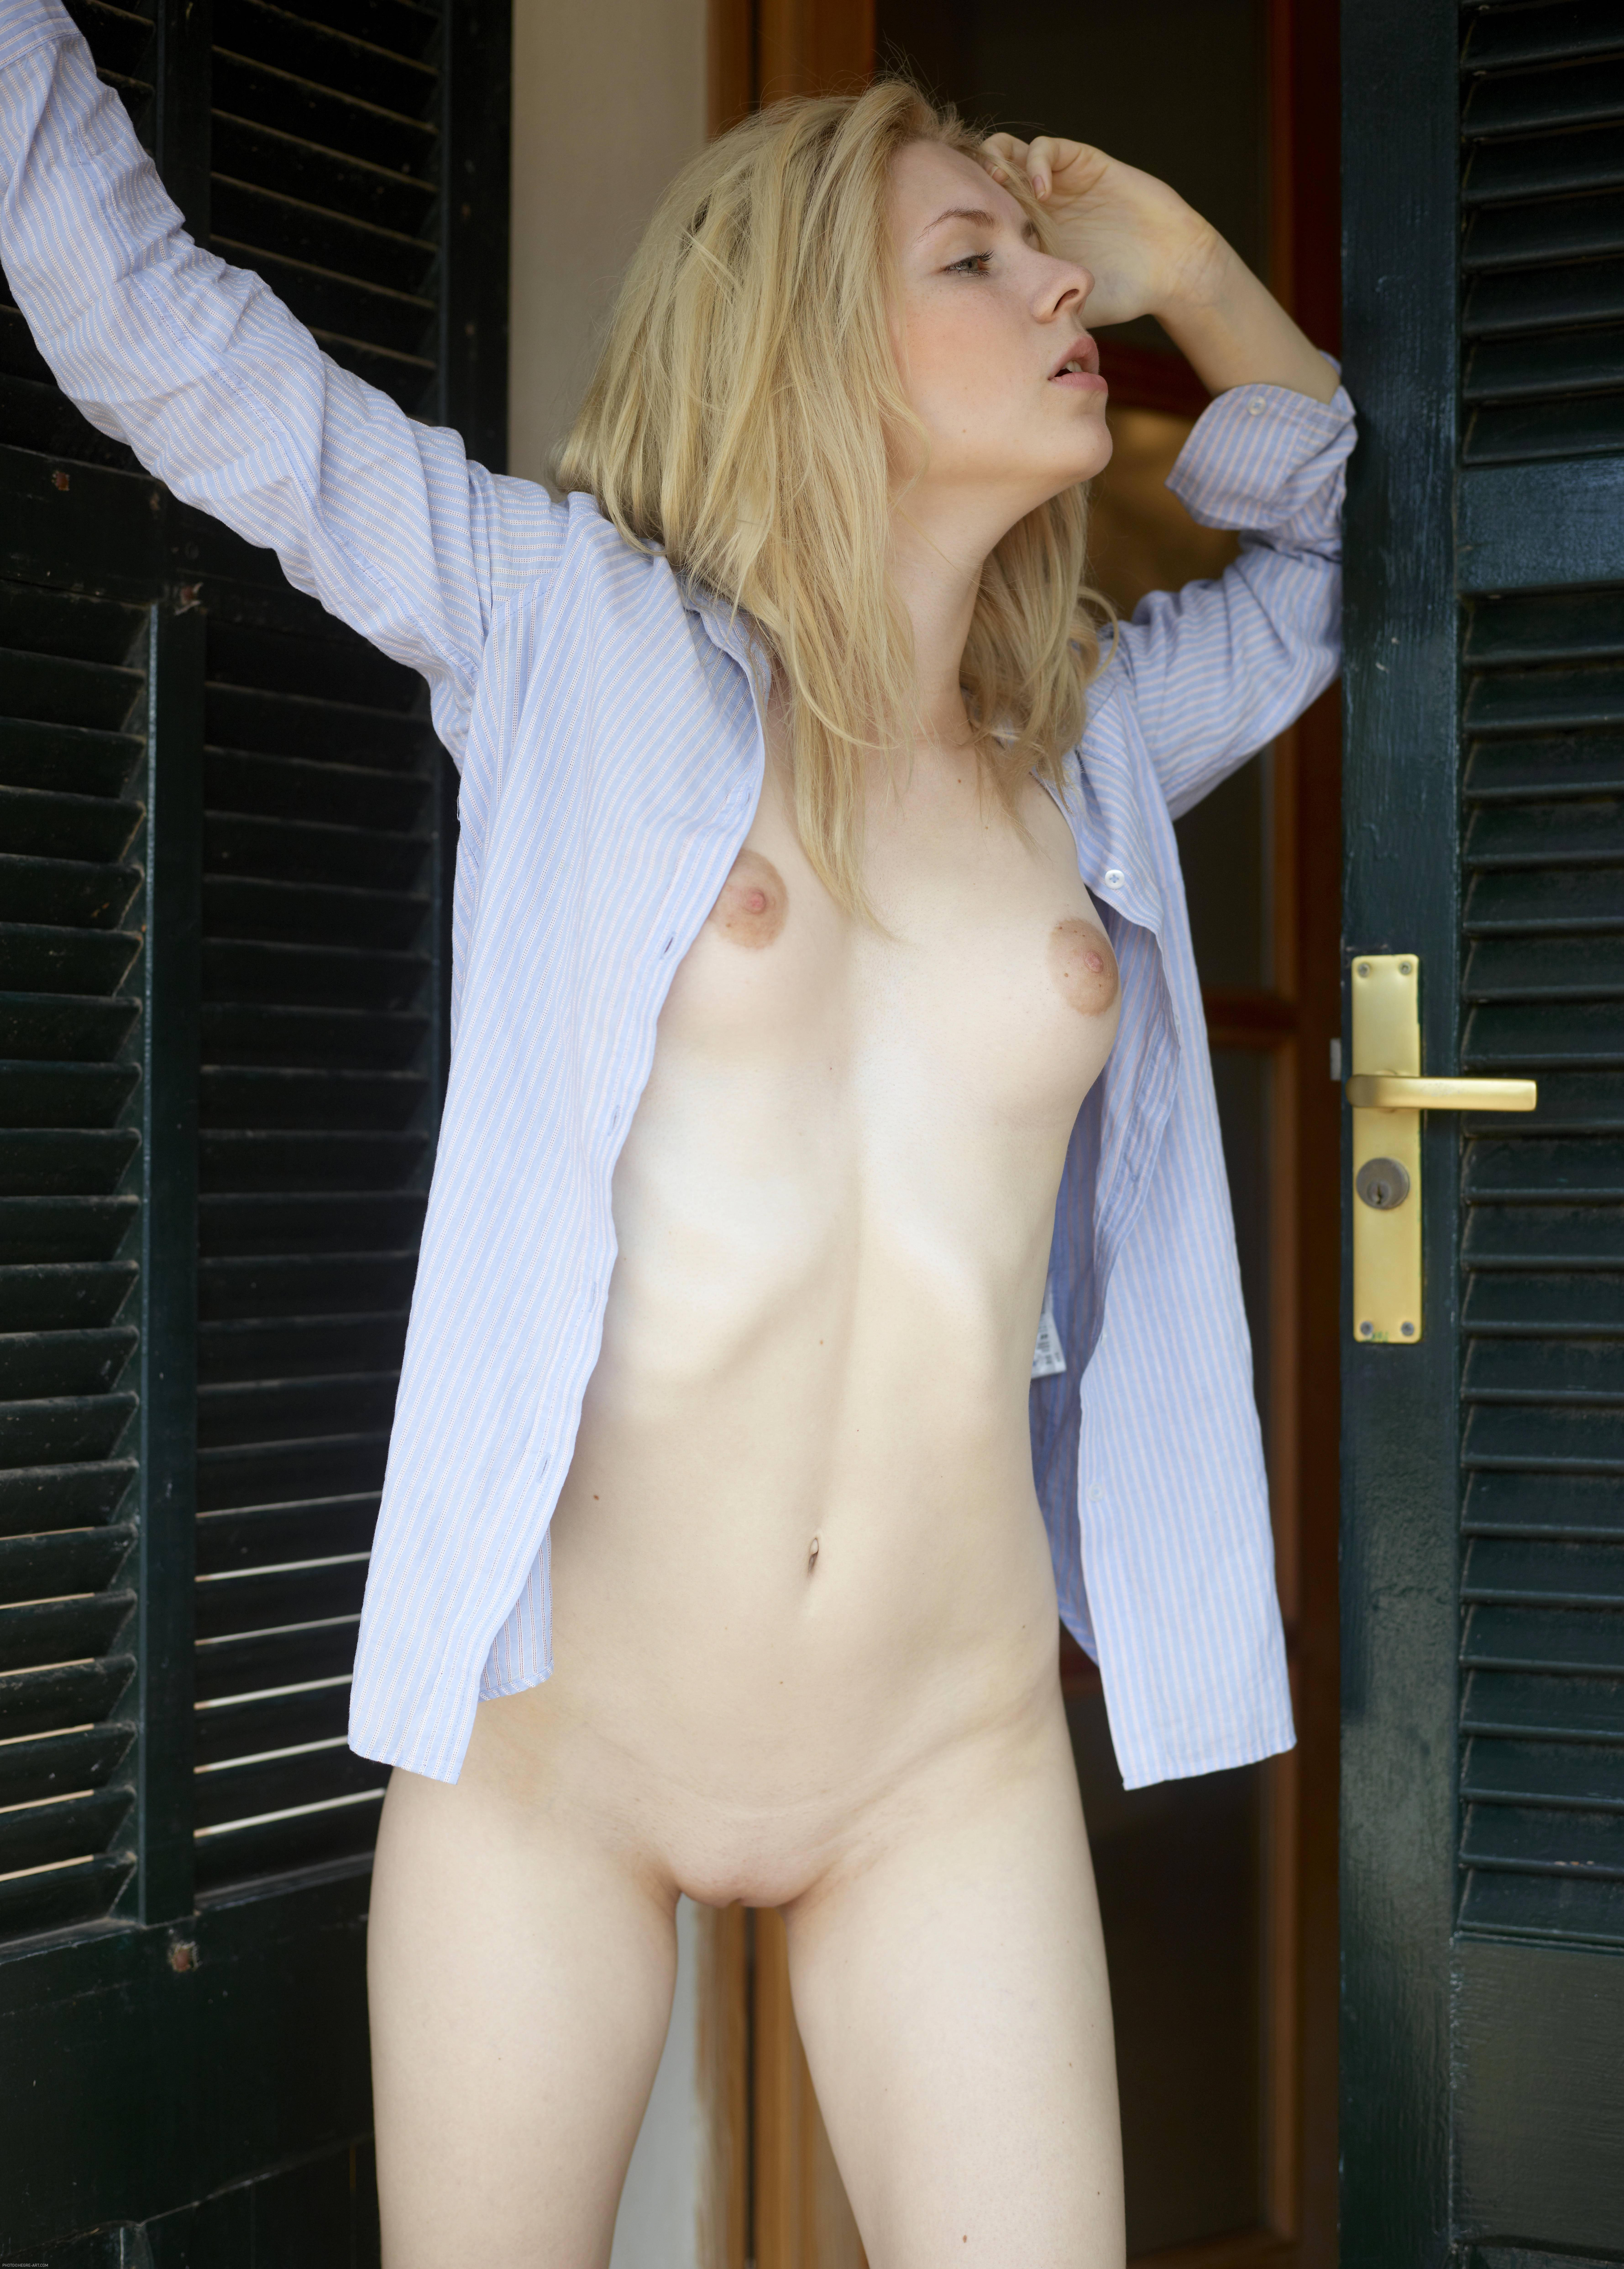 Aisha takia boobs clear photo